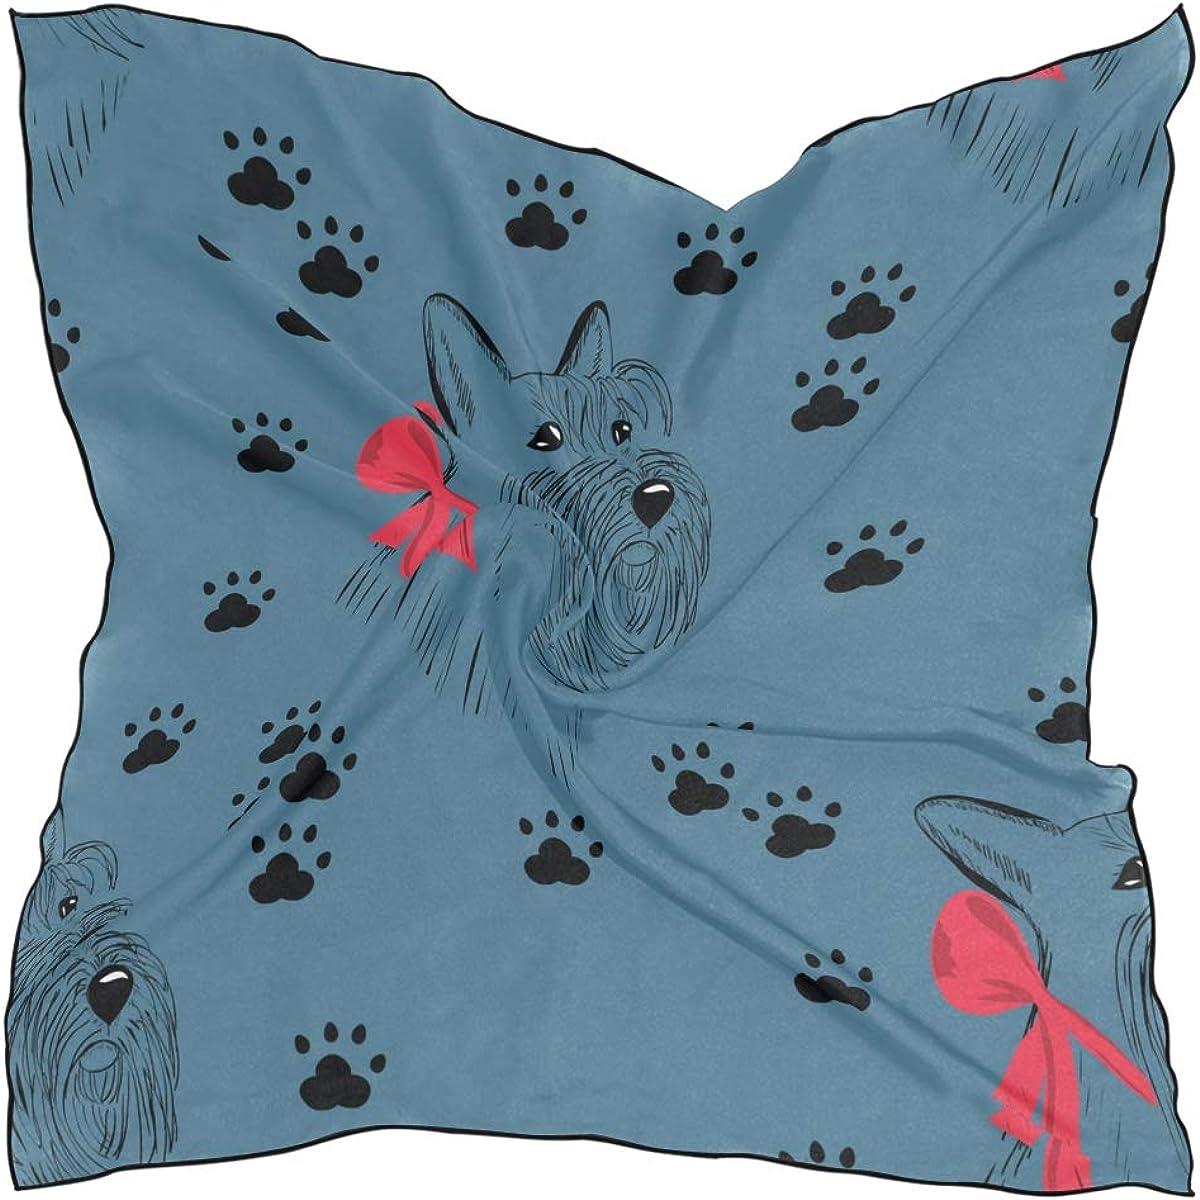 Women's Soft Polyester Silk Square Scarf Scottish Terrier Pet Dog Cute Cartoon Design Furry Fashion Print Head & Hair Scarf Neckerchief Accessory-23.6x23.6 Inch